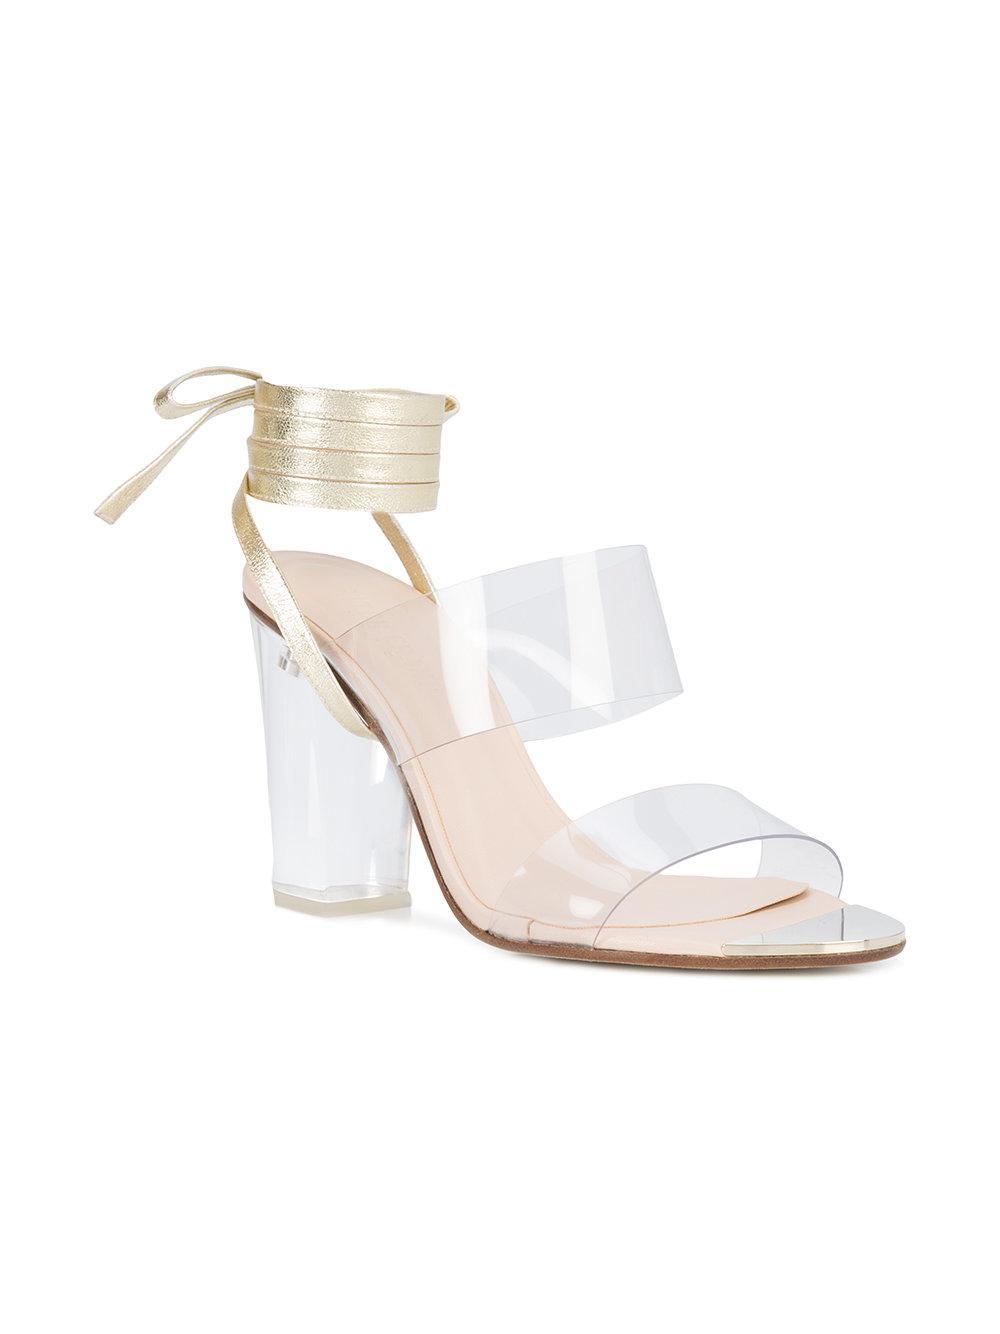 8c6342b7579f Lyst - Ritch Erani Nyfc Clara Wrap Sandals in Metallic